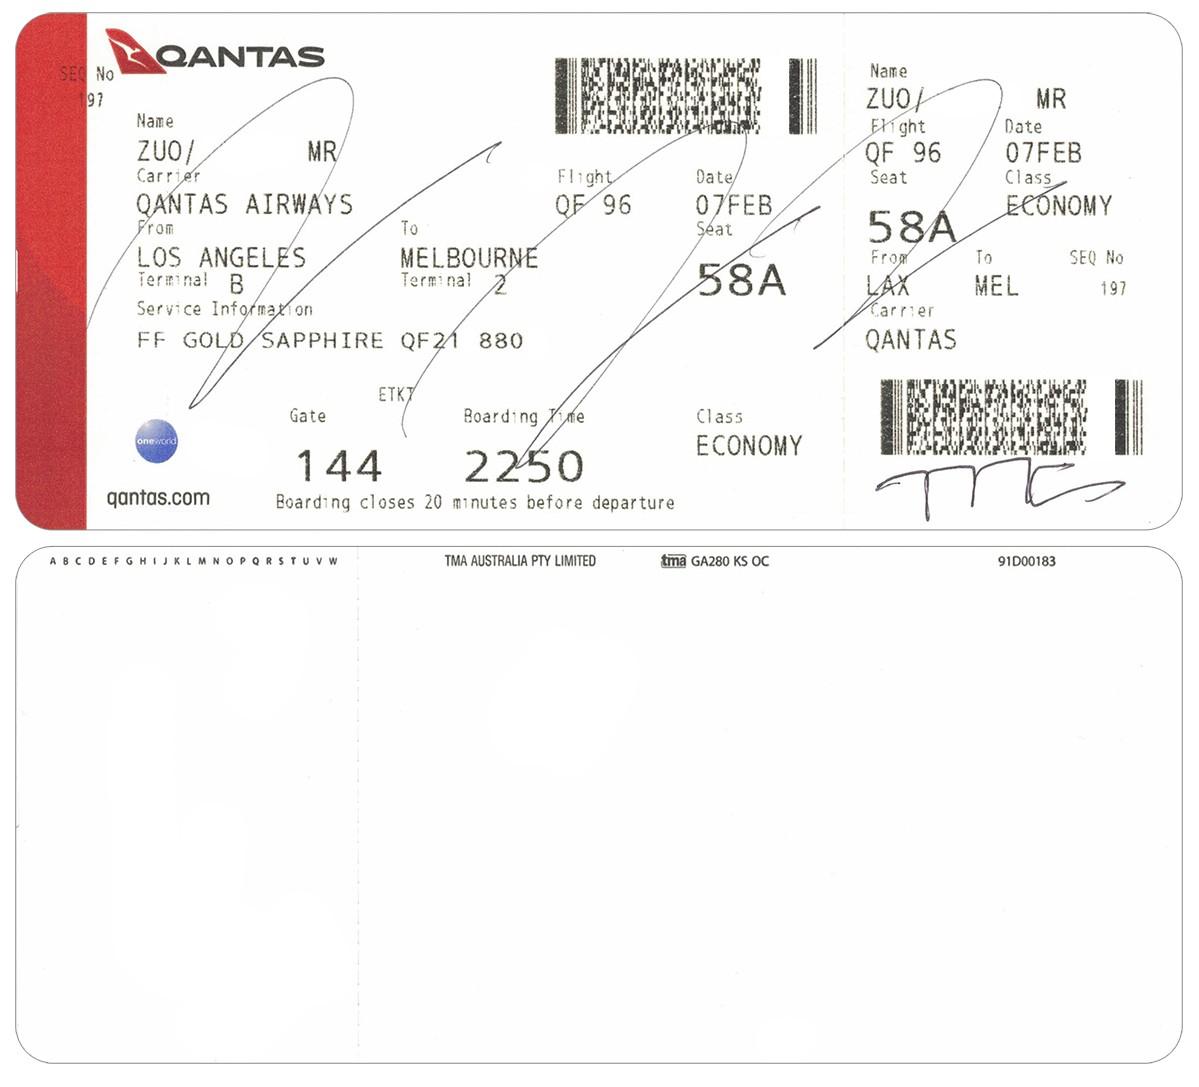 Re: [原创]【 半球冬夏·洛城快达 | 袋鼠全新 789 | 丛林流浪号·直航 LA 】 BOEING 787-9 VH-ZNB 空中